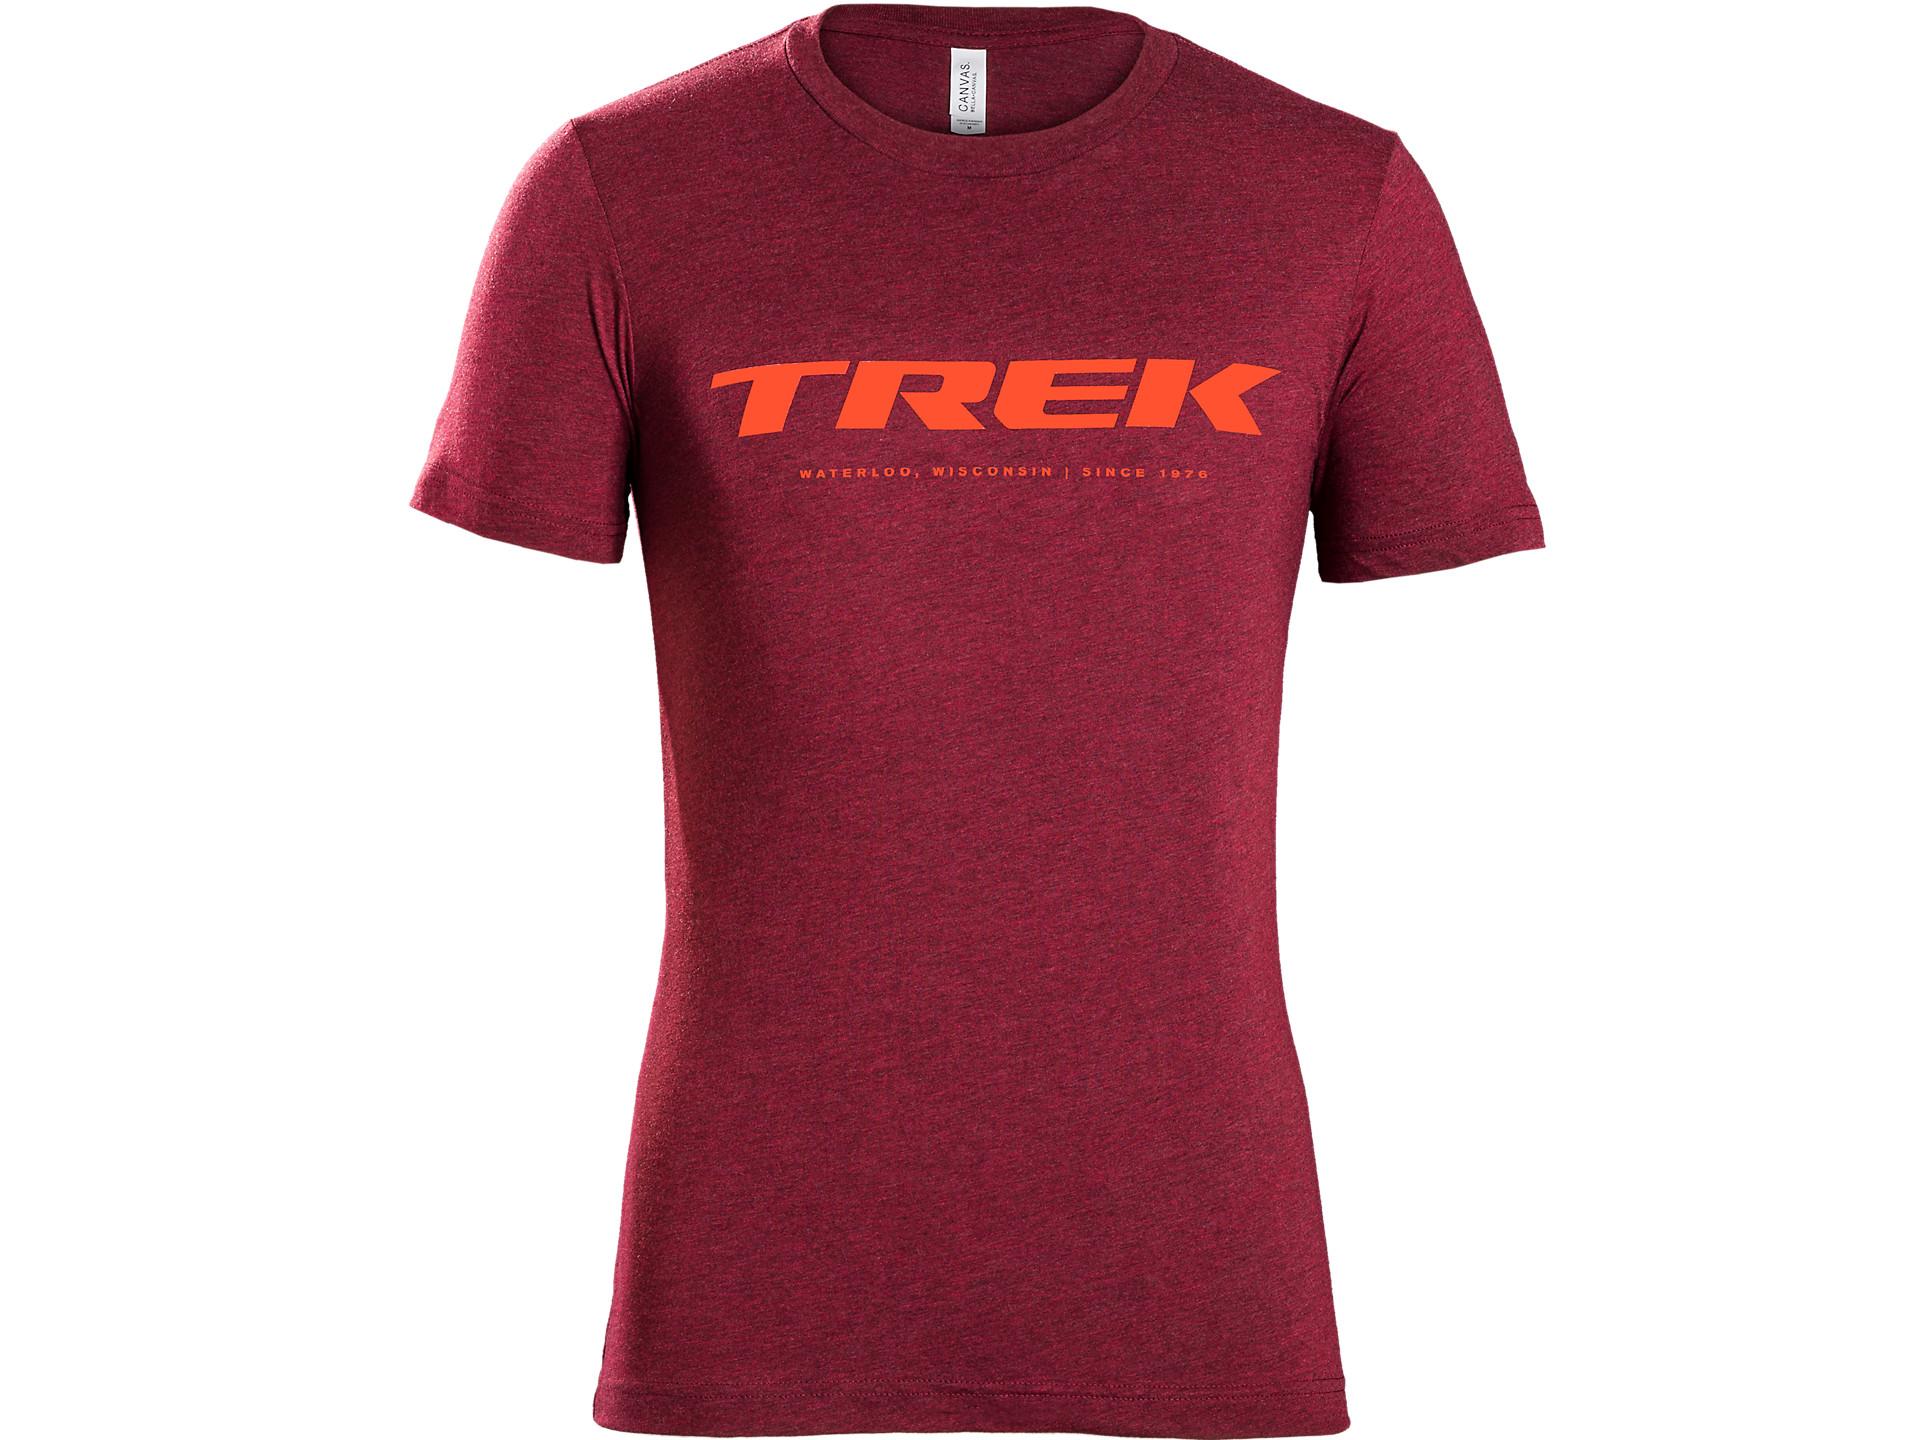 93436d7bca0 T-shirt Santini Équipe Trek-Segafredo pour hommes